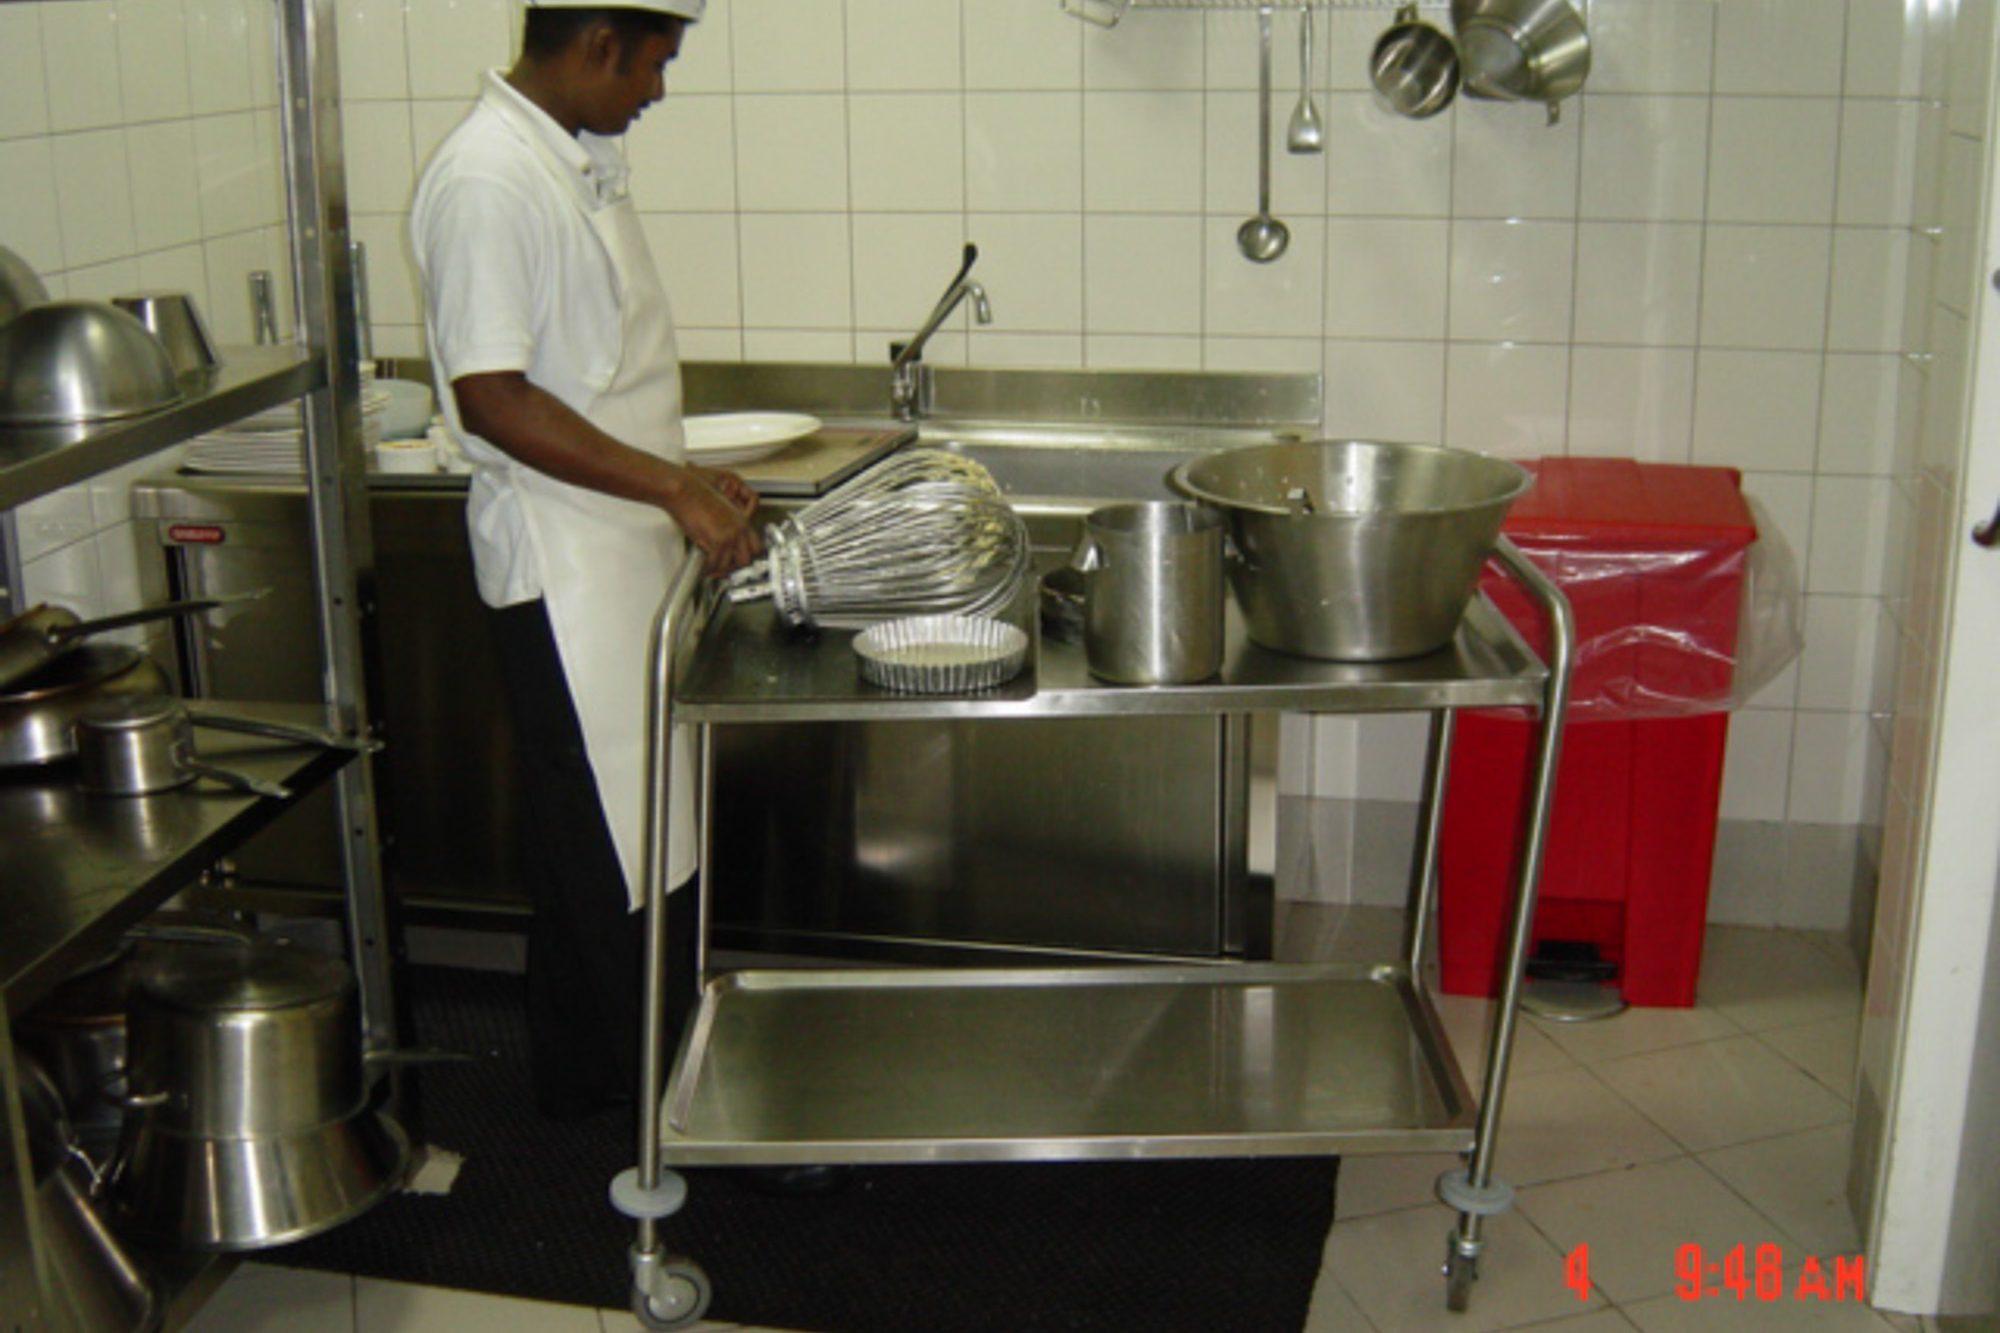 Italia_kitchen_-le_meridien_f-10